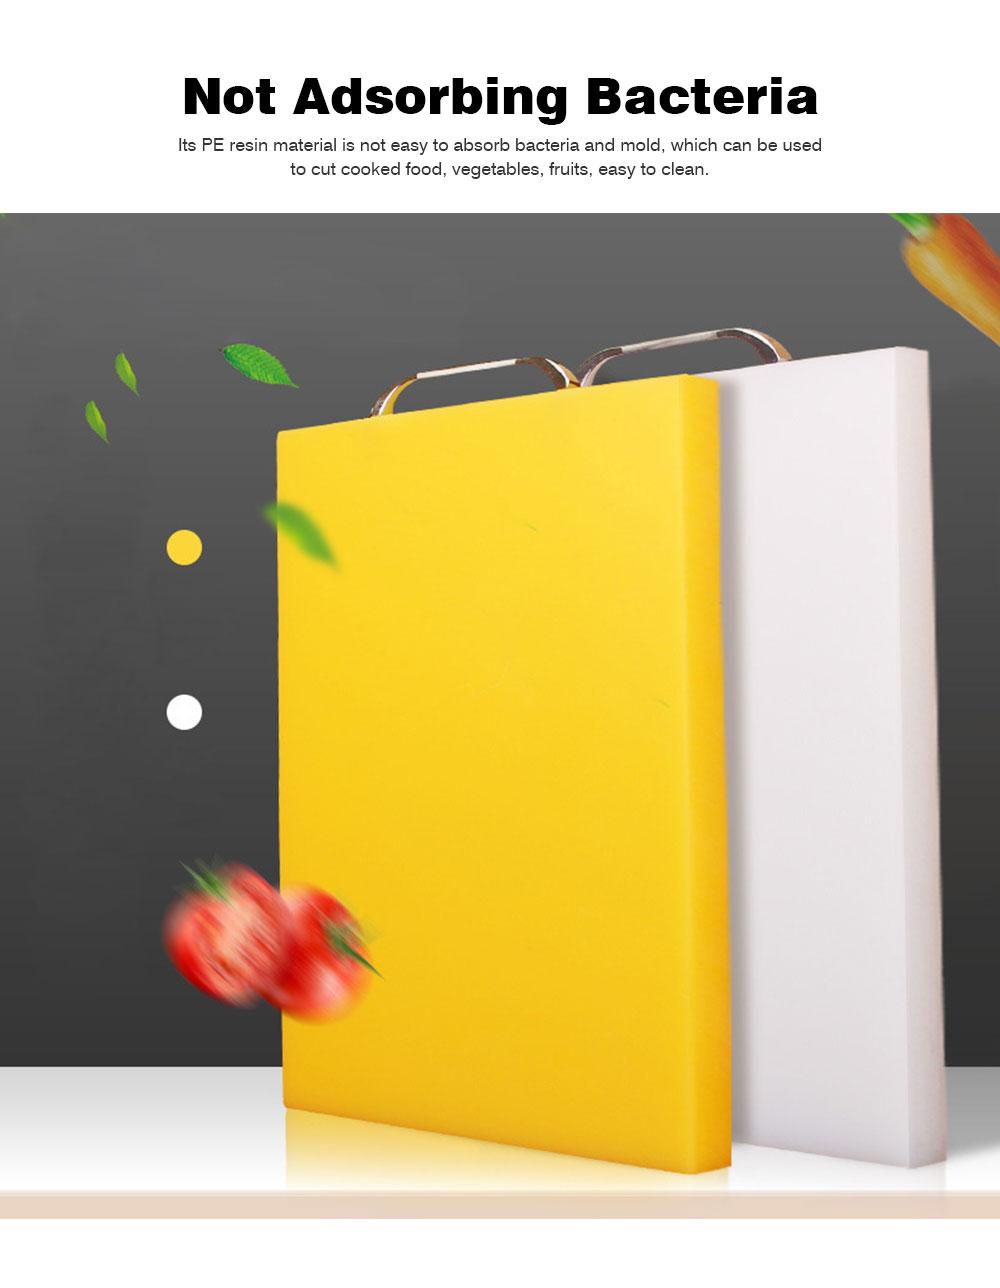 Anti-slip Multi-function Cutting Board, High-quality PE Cutting Board for Cutting Cooked Food, Vegetables, Fruits 2